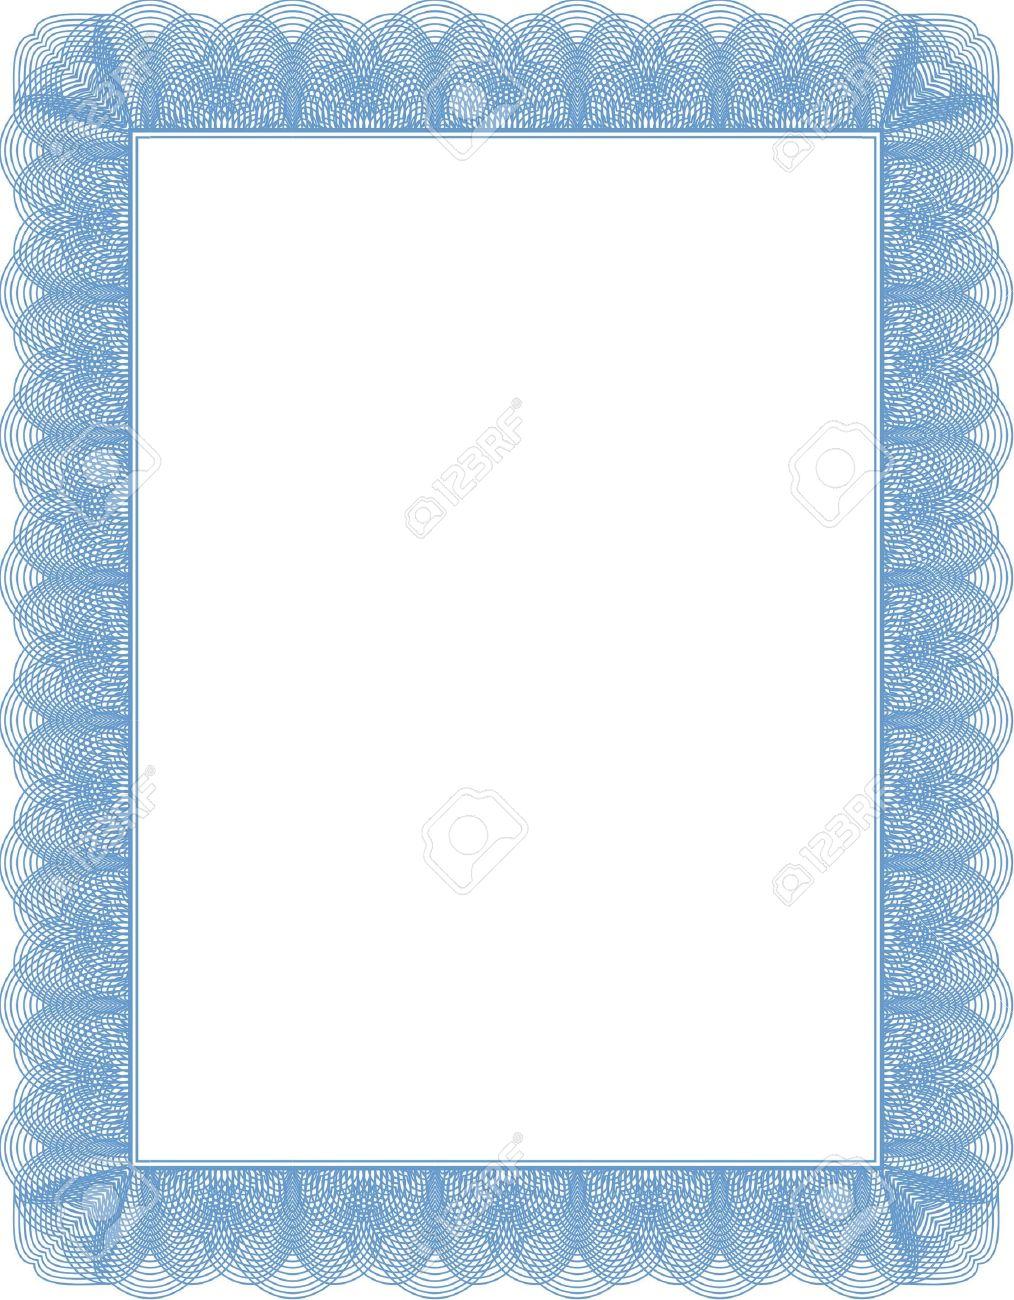 Doc900636 Blank Certificate Template 40 Free – Certificate Template Blank